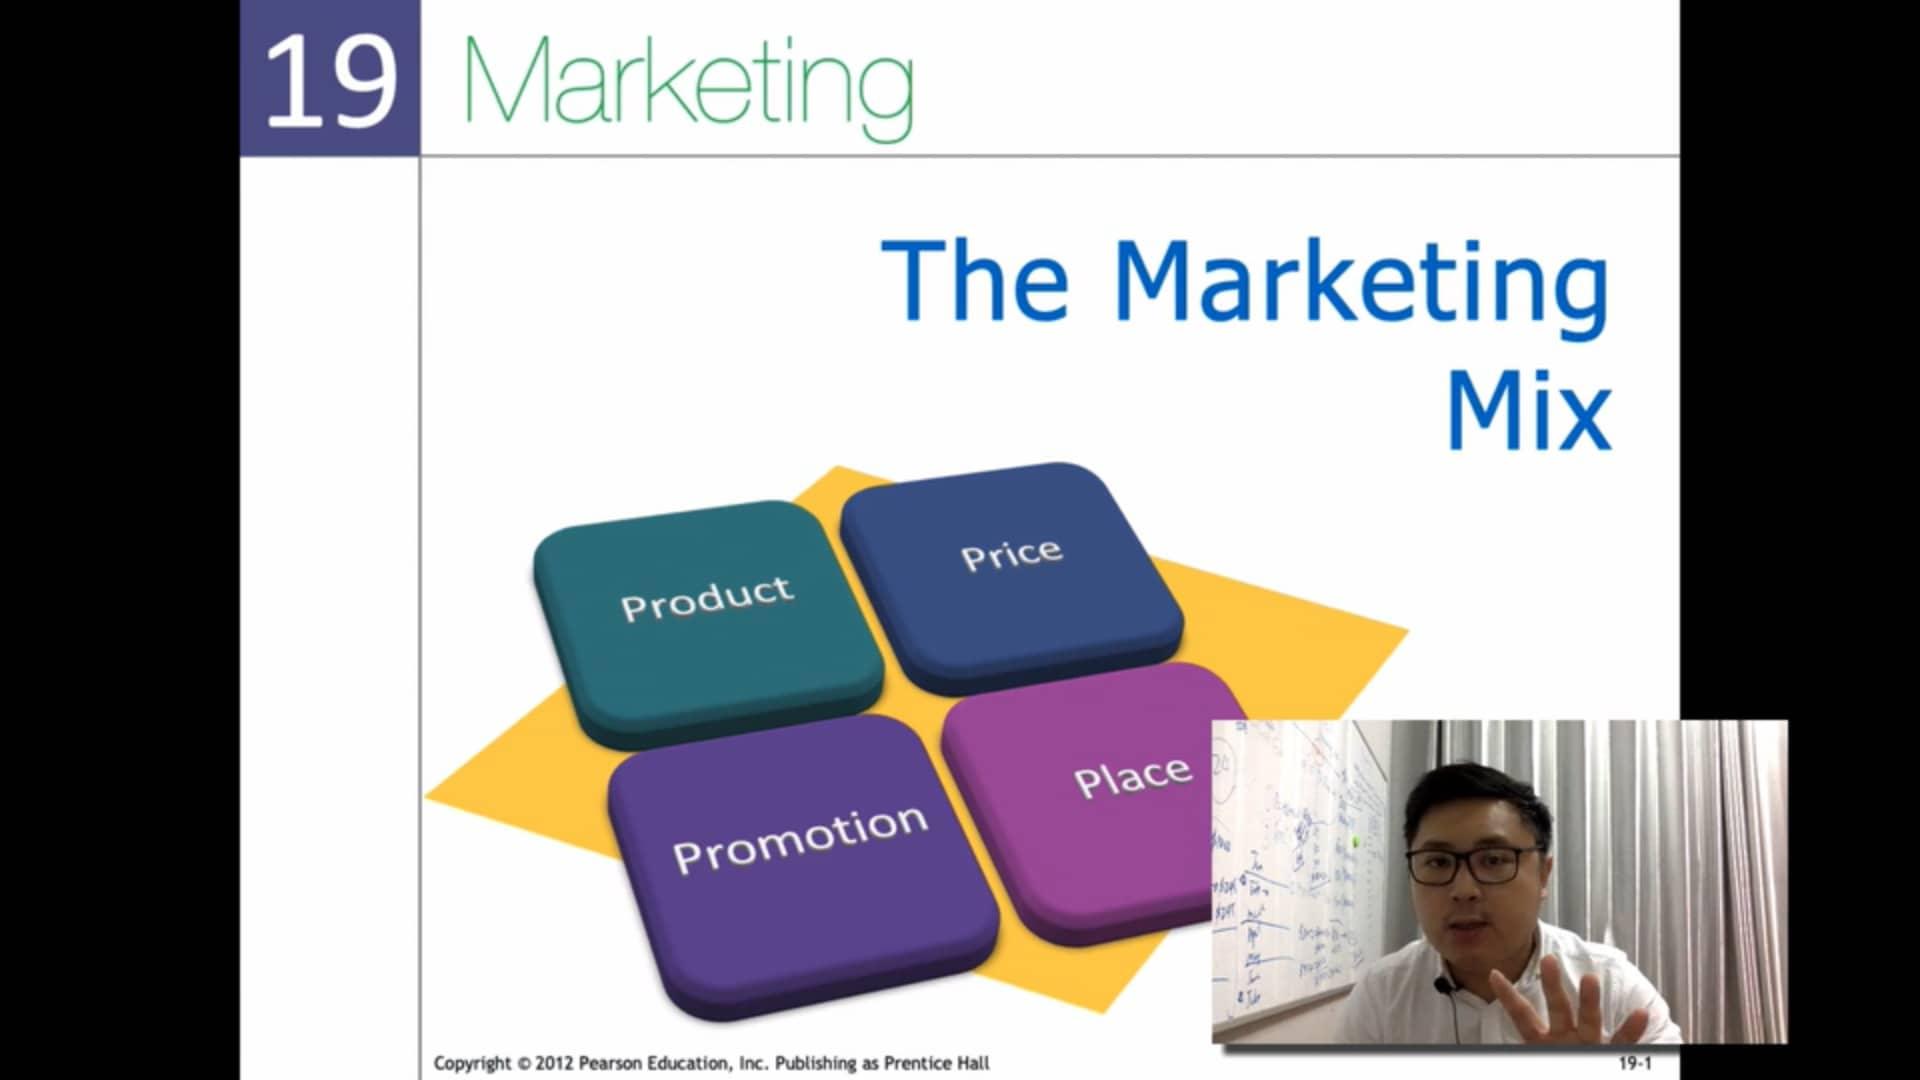 Marketing mix COC Marketing 4